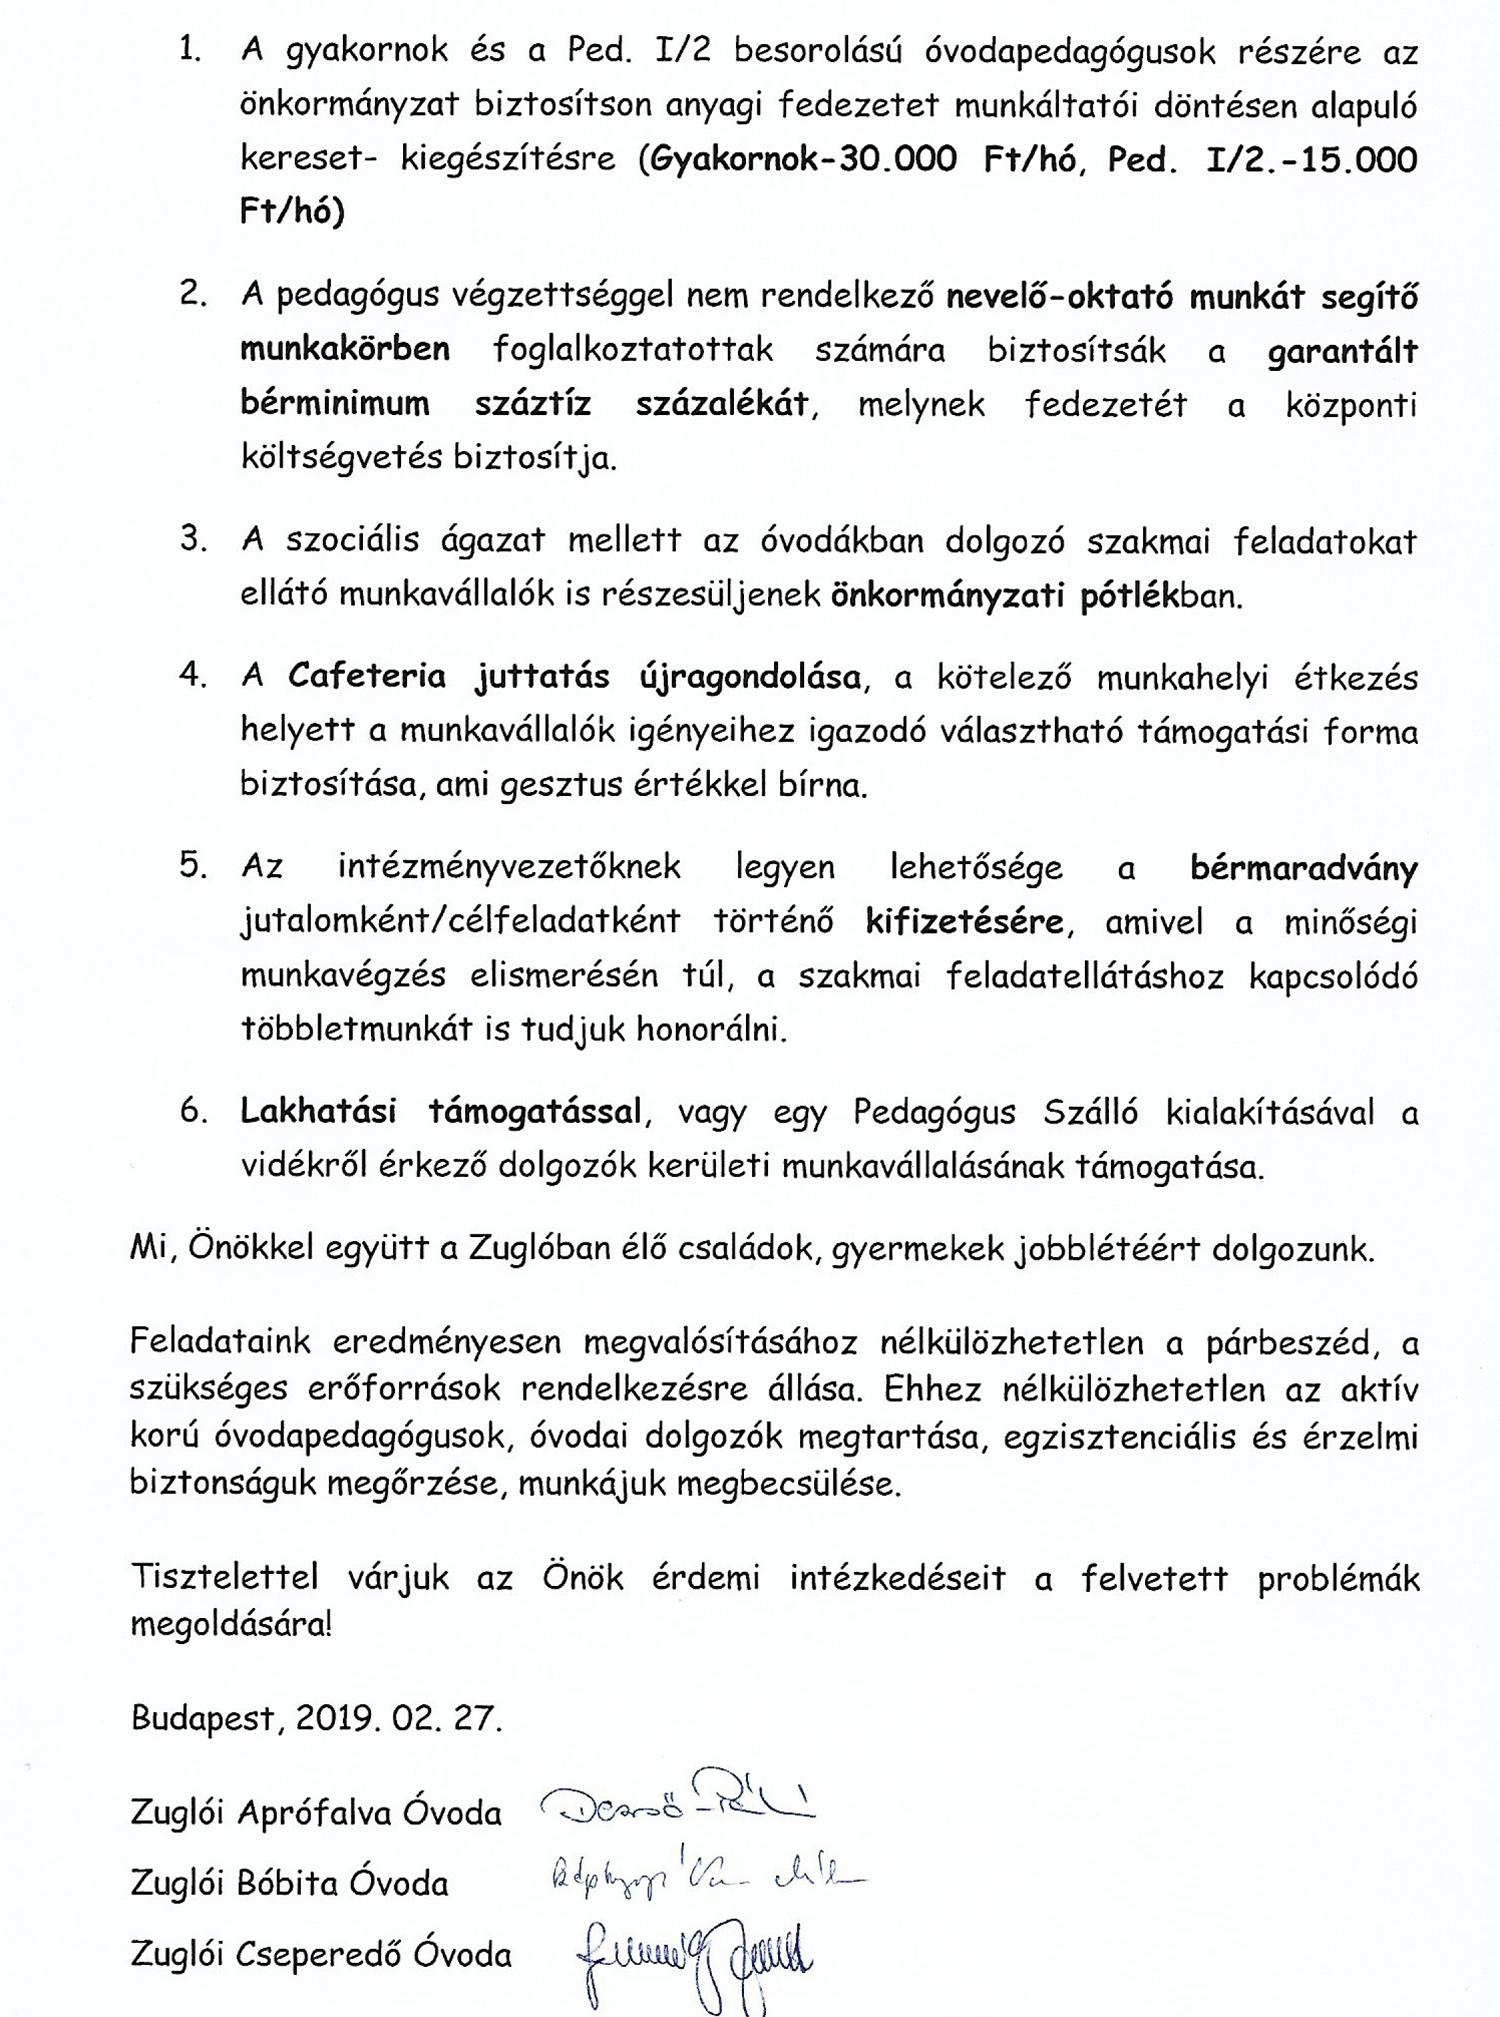 kepviselo-testuleti_level_zugloi_ovodak_20190227-4.jpg